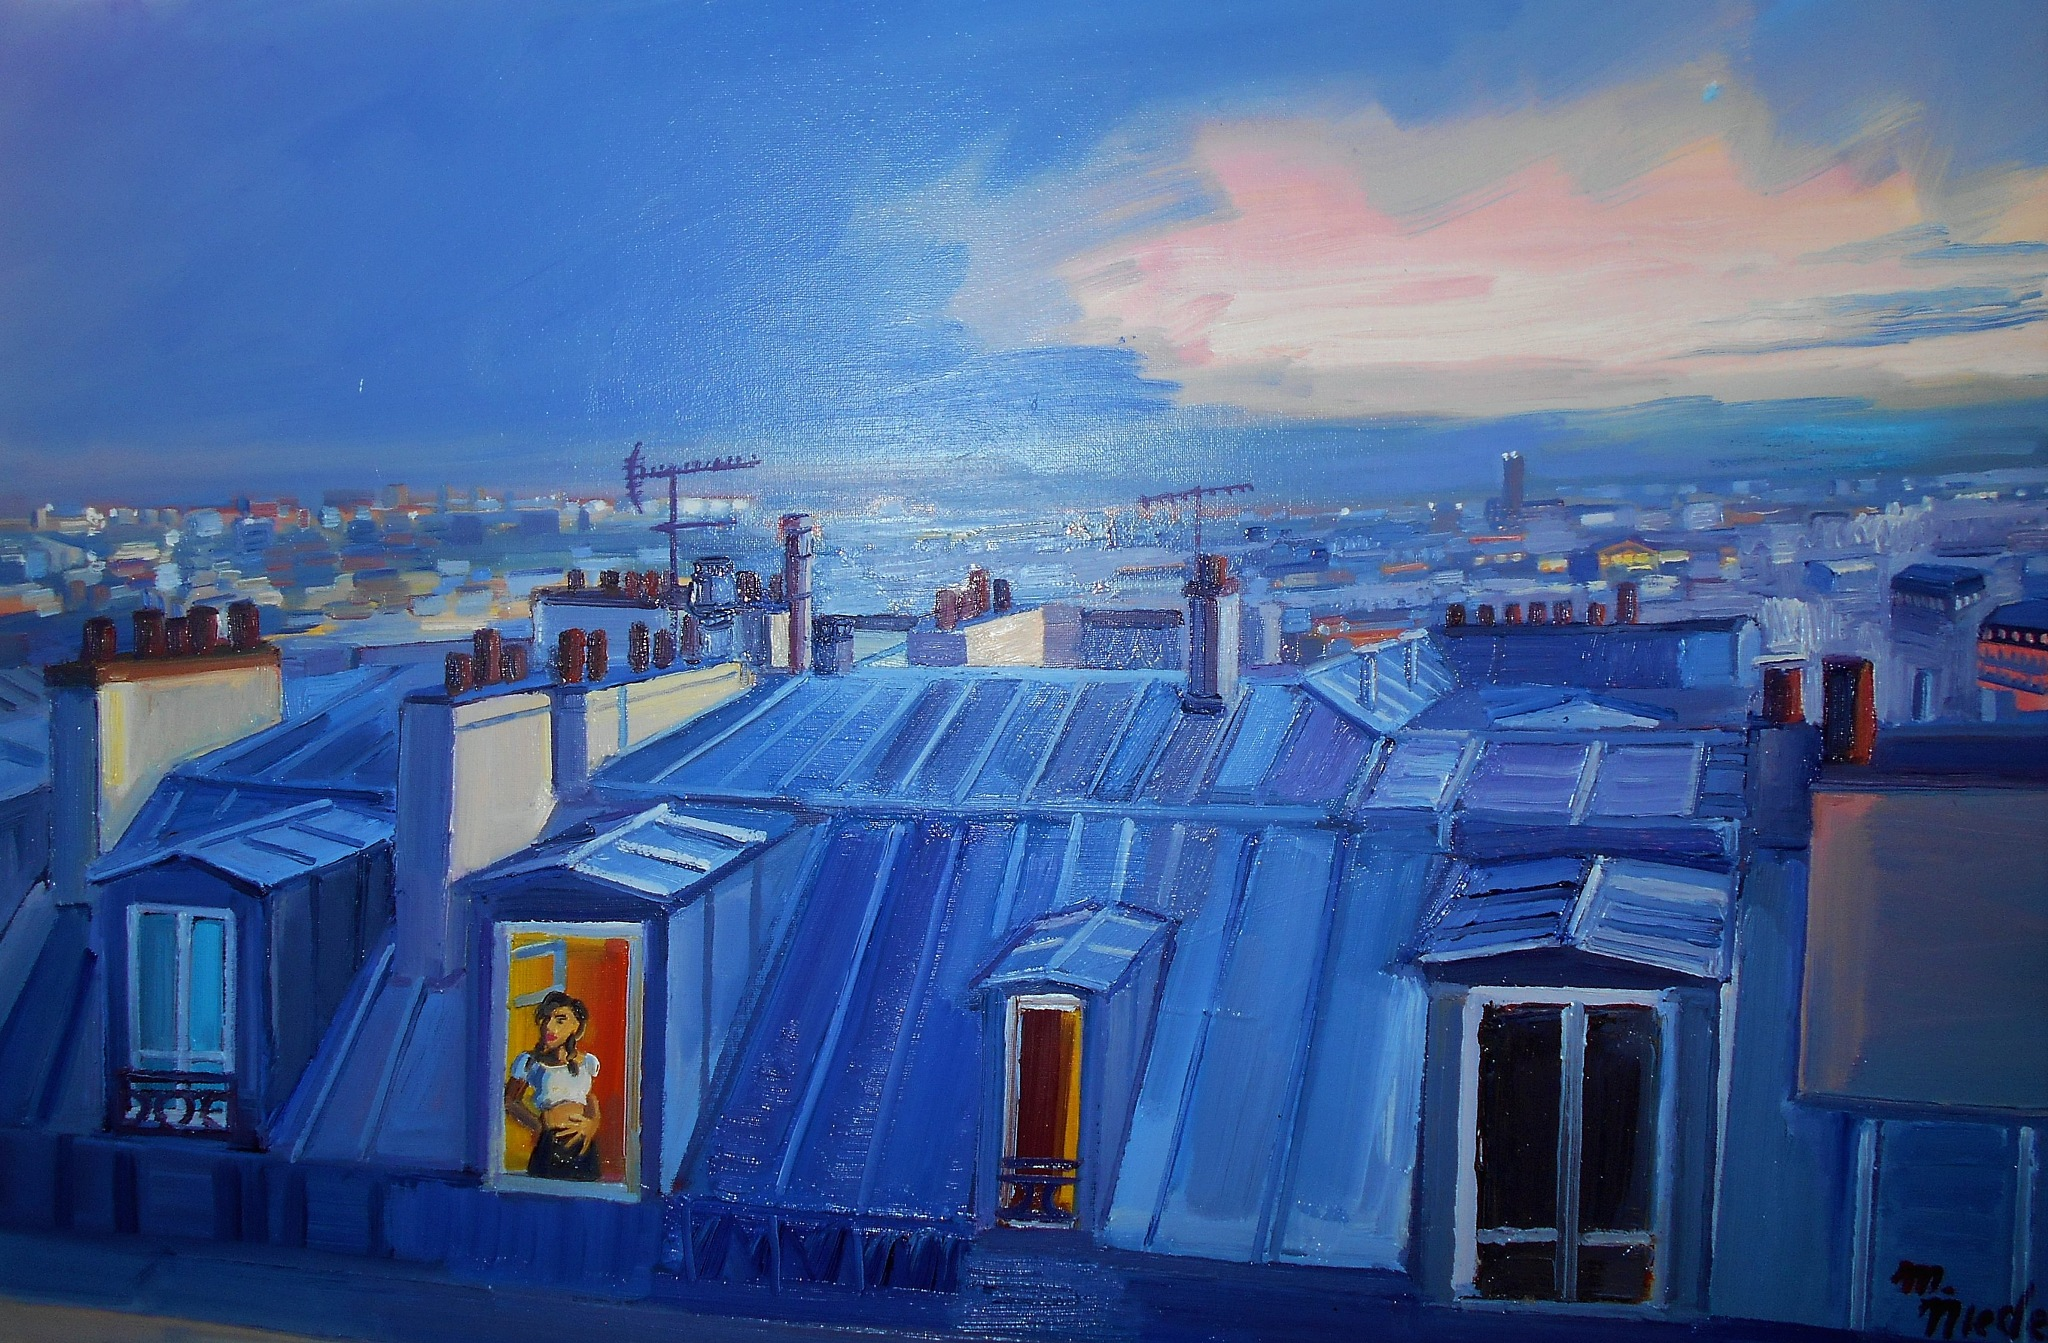 Paris Roofs,Full Size by Markus Nieden